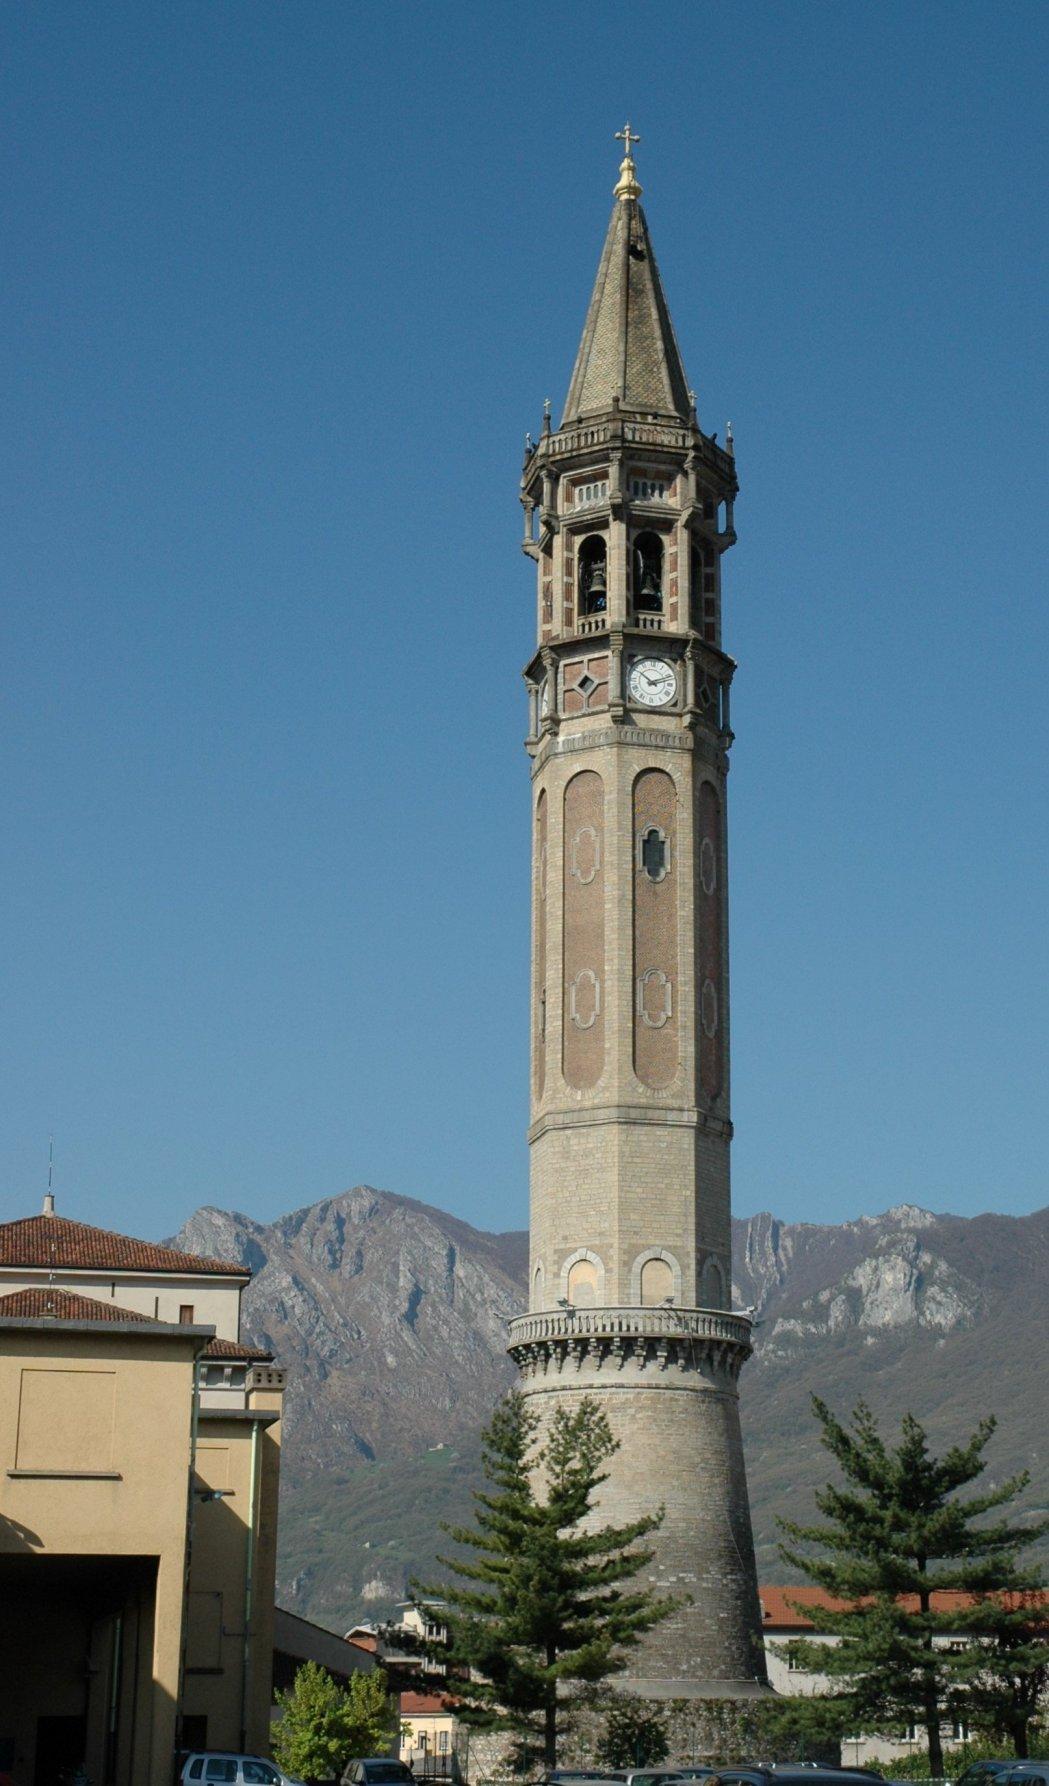 Glockenturm der Basilika S. Nicolò